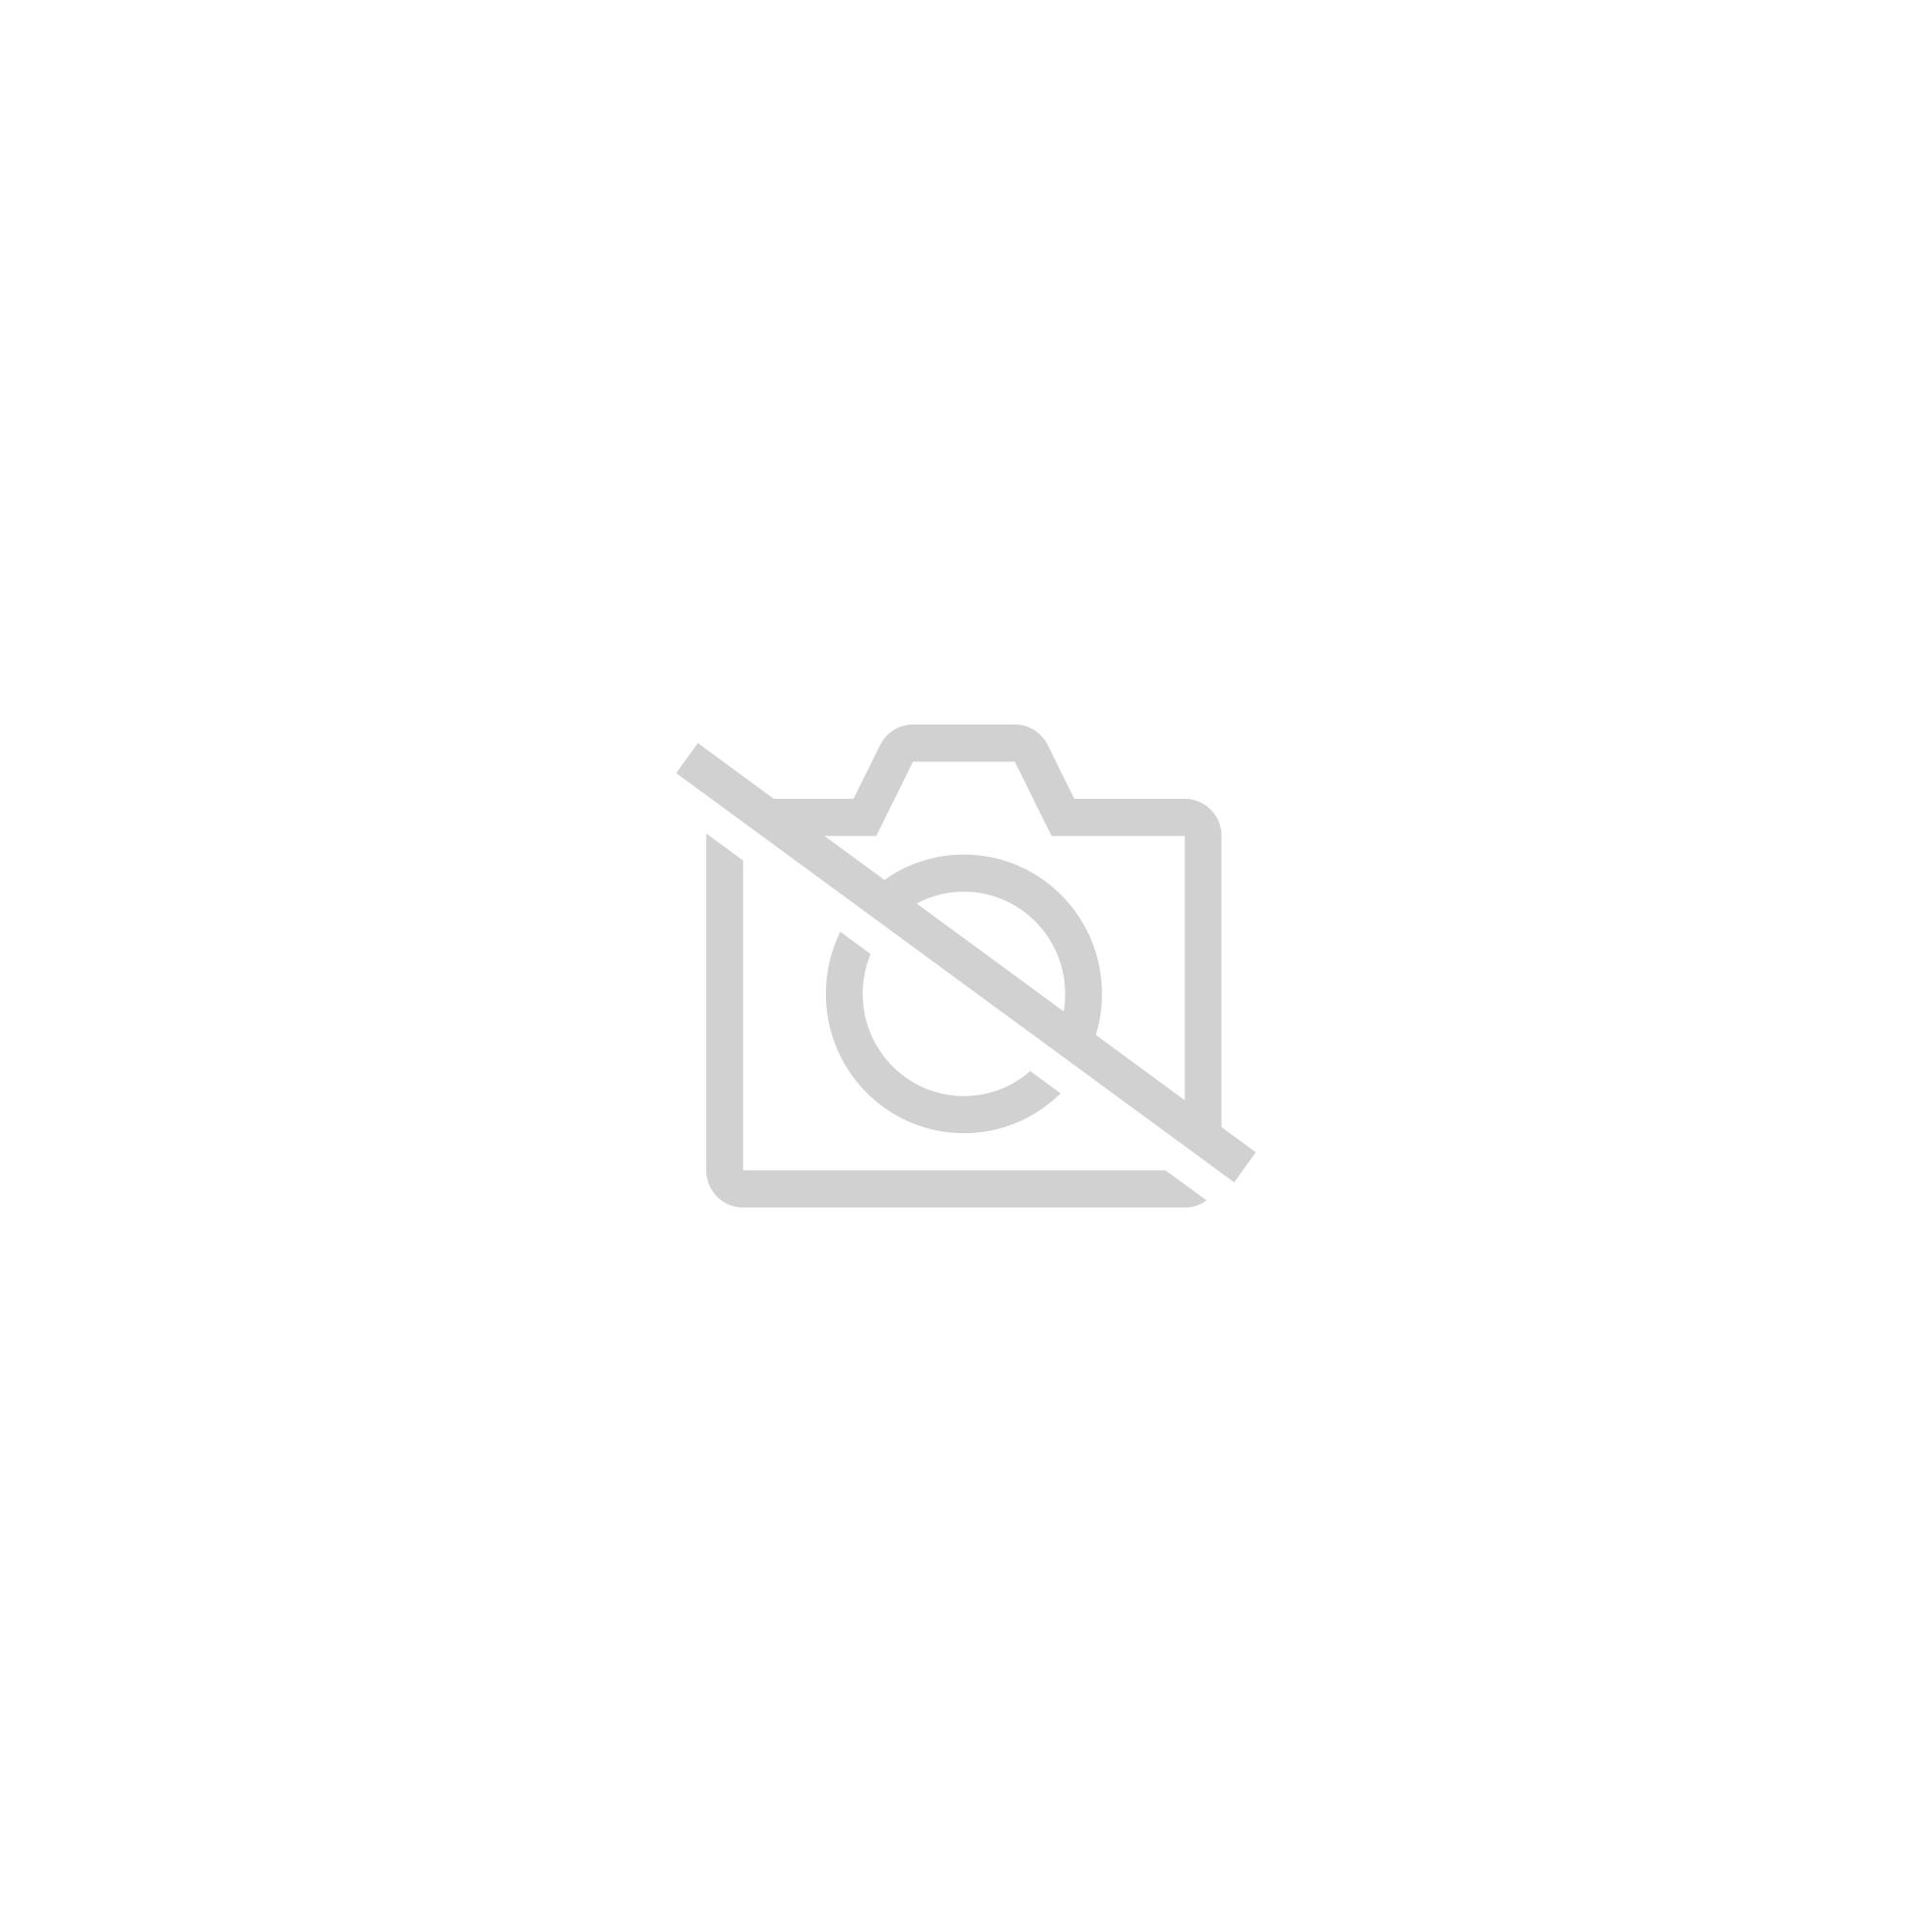 guitare basse et accessoire art lutherie achat vente neuf d 39 occasion. Black Bedroom Furniture Sets. Home Design Ideas